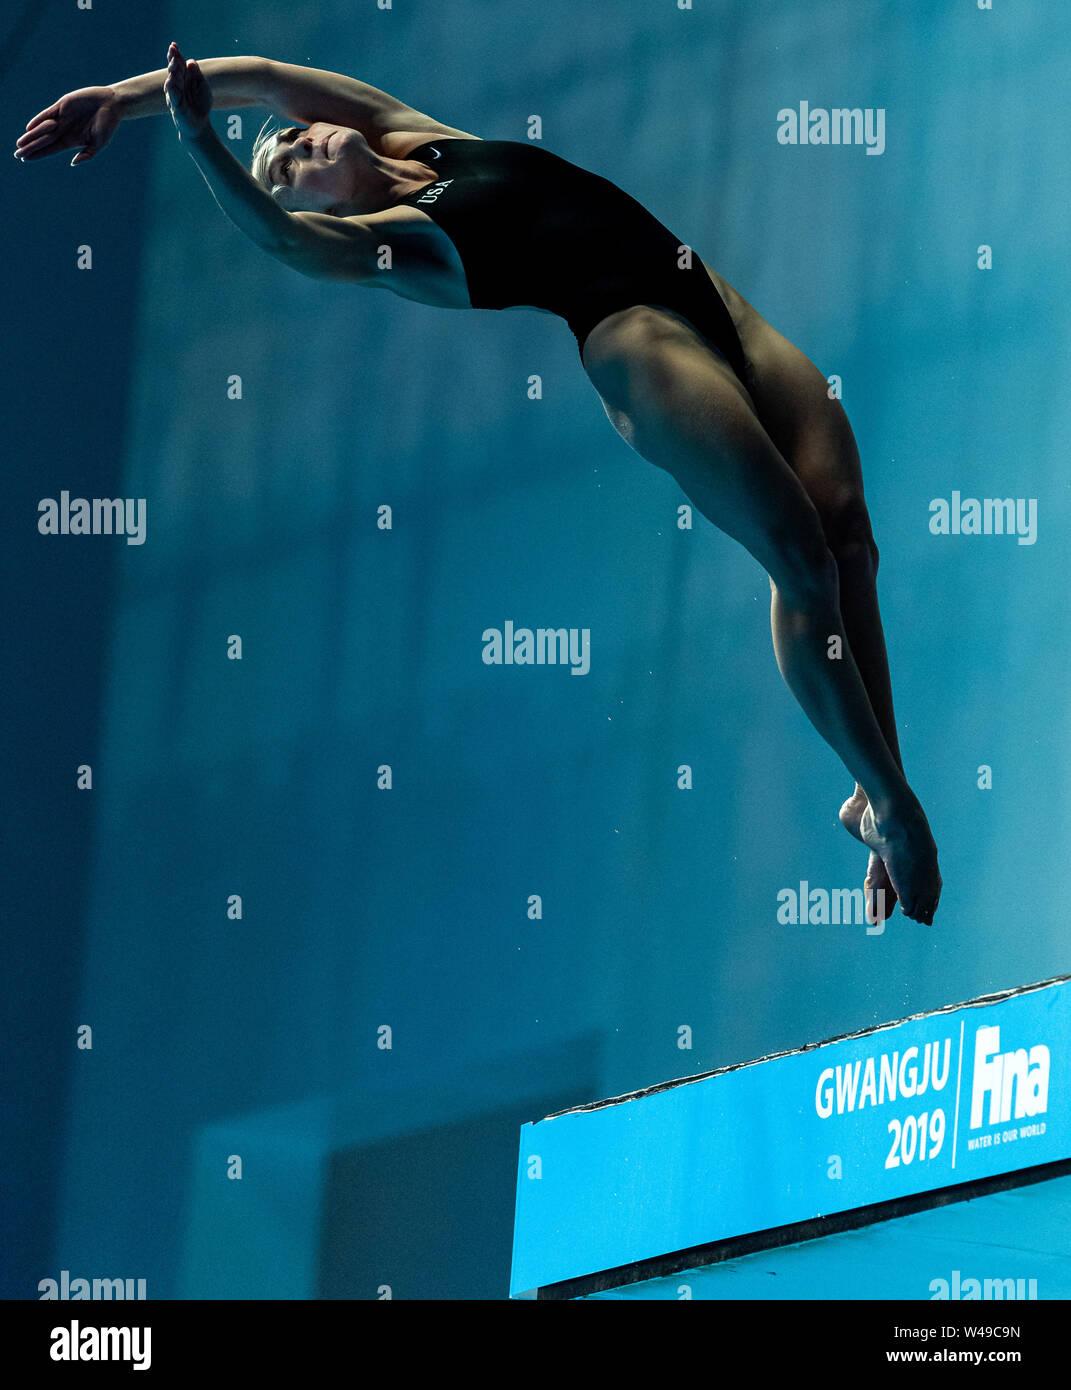 17 july 2019 Gwangju, South Korea 18th FINA World Aquatics Championships  17-07-2019: Zwemmen: Diving 10m Platform Final: Gwangju SCHNELL Delaney USA Stock Photo